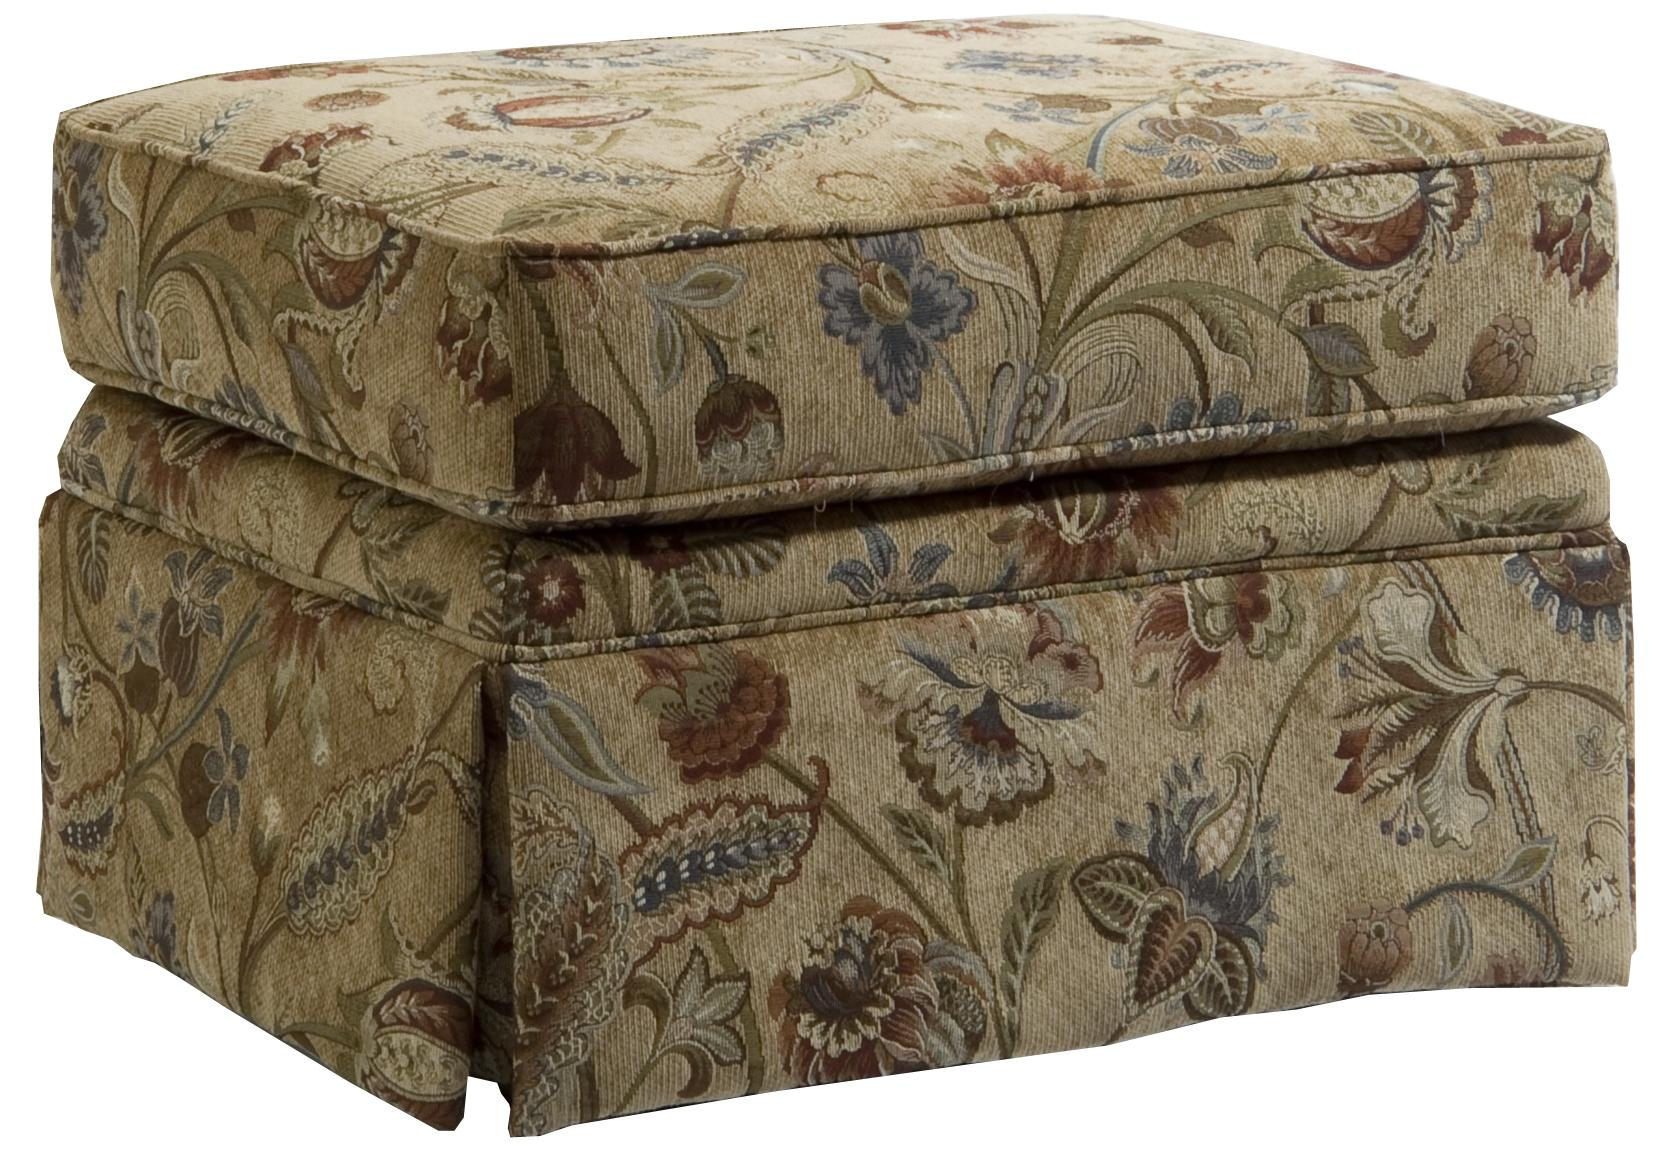 Broyhill Furniture Audrey Ottoman - Item Number: 3762-5